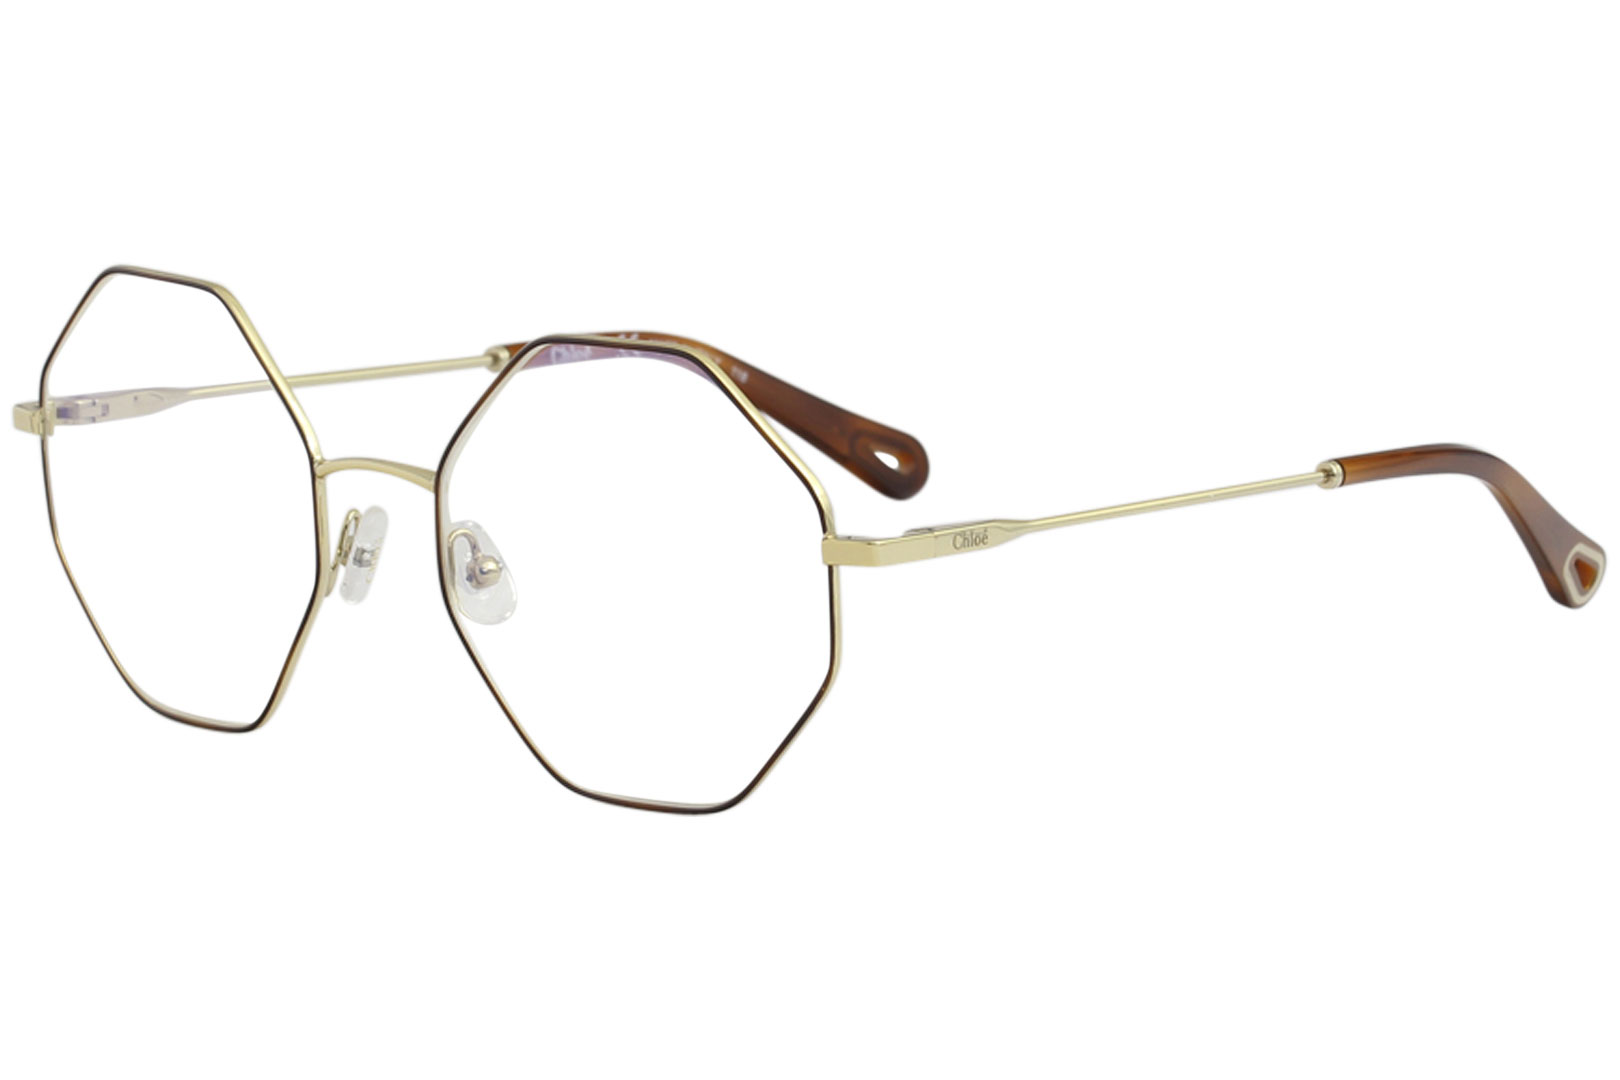 95087455697 Chloe Women s Eyeglasses CE2134 CE 2134 757 Gold Havana Optical ...